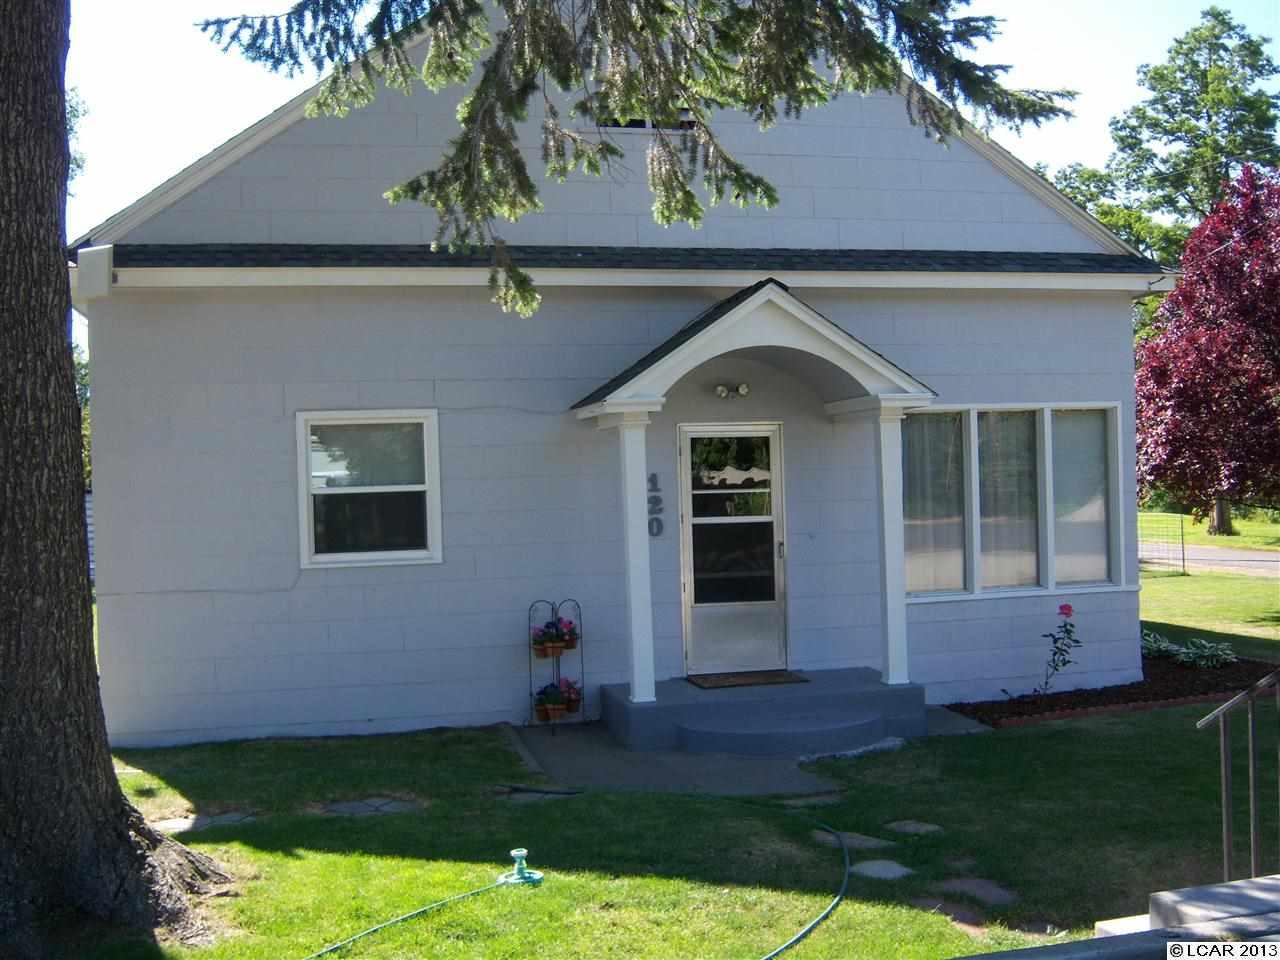 Real Estate for Sale, ListingId: 31352208, Pomeroy,WA99347